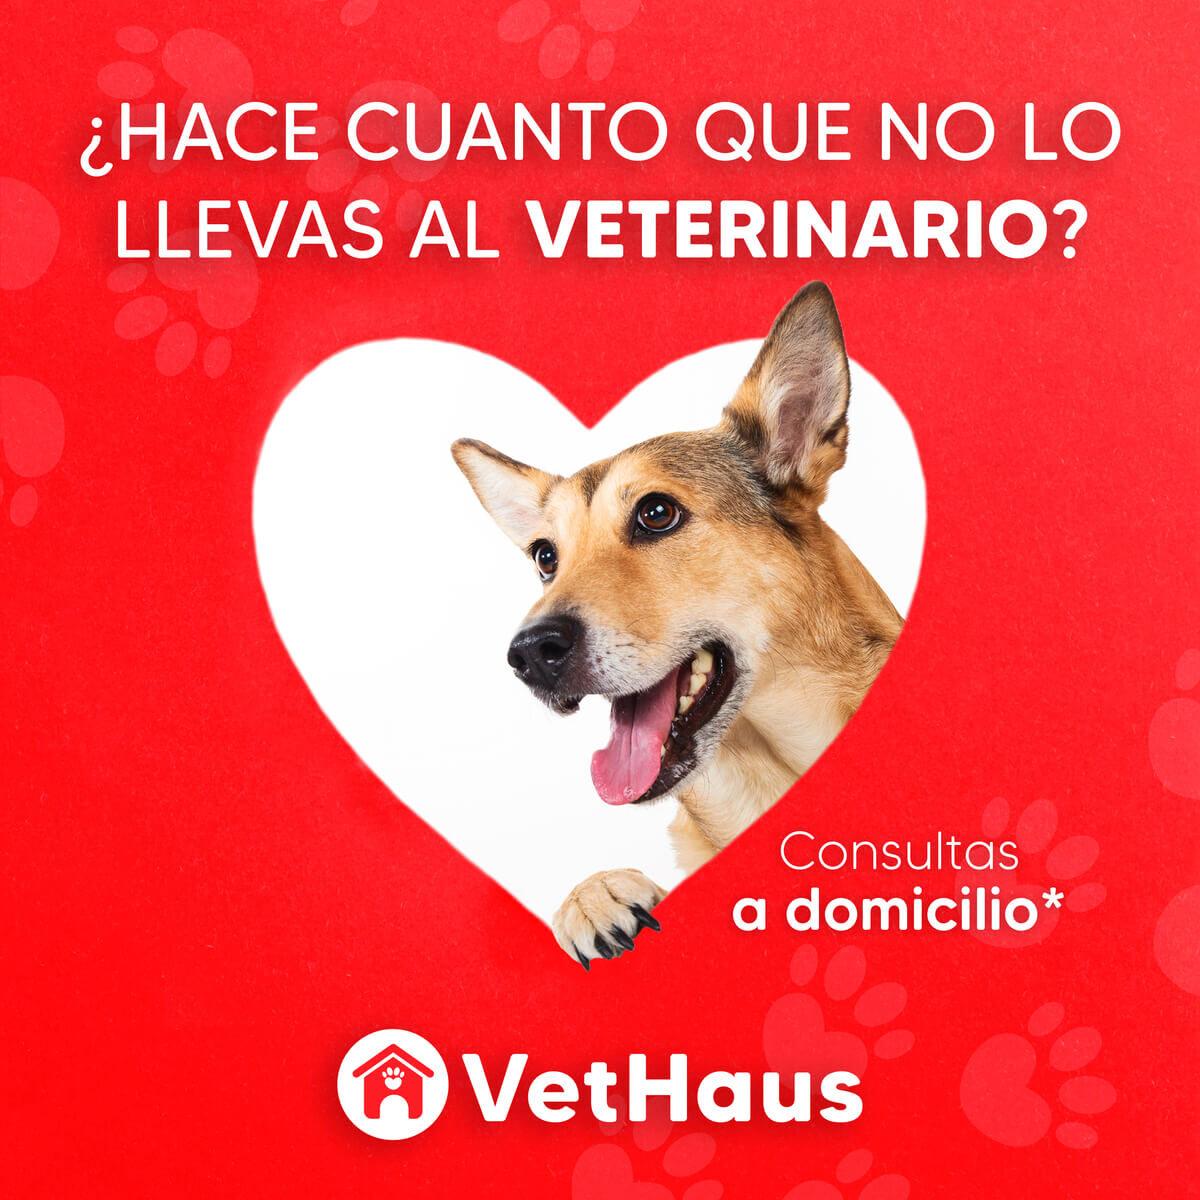 Vethaus